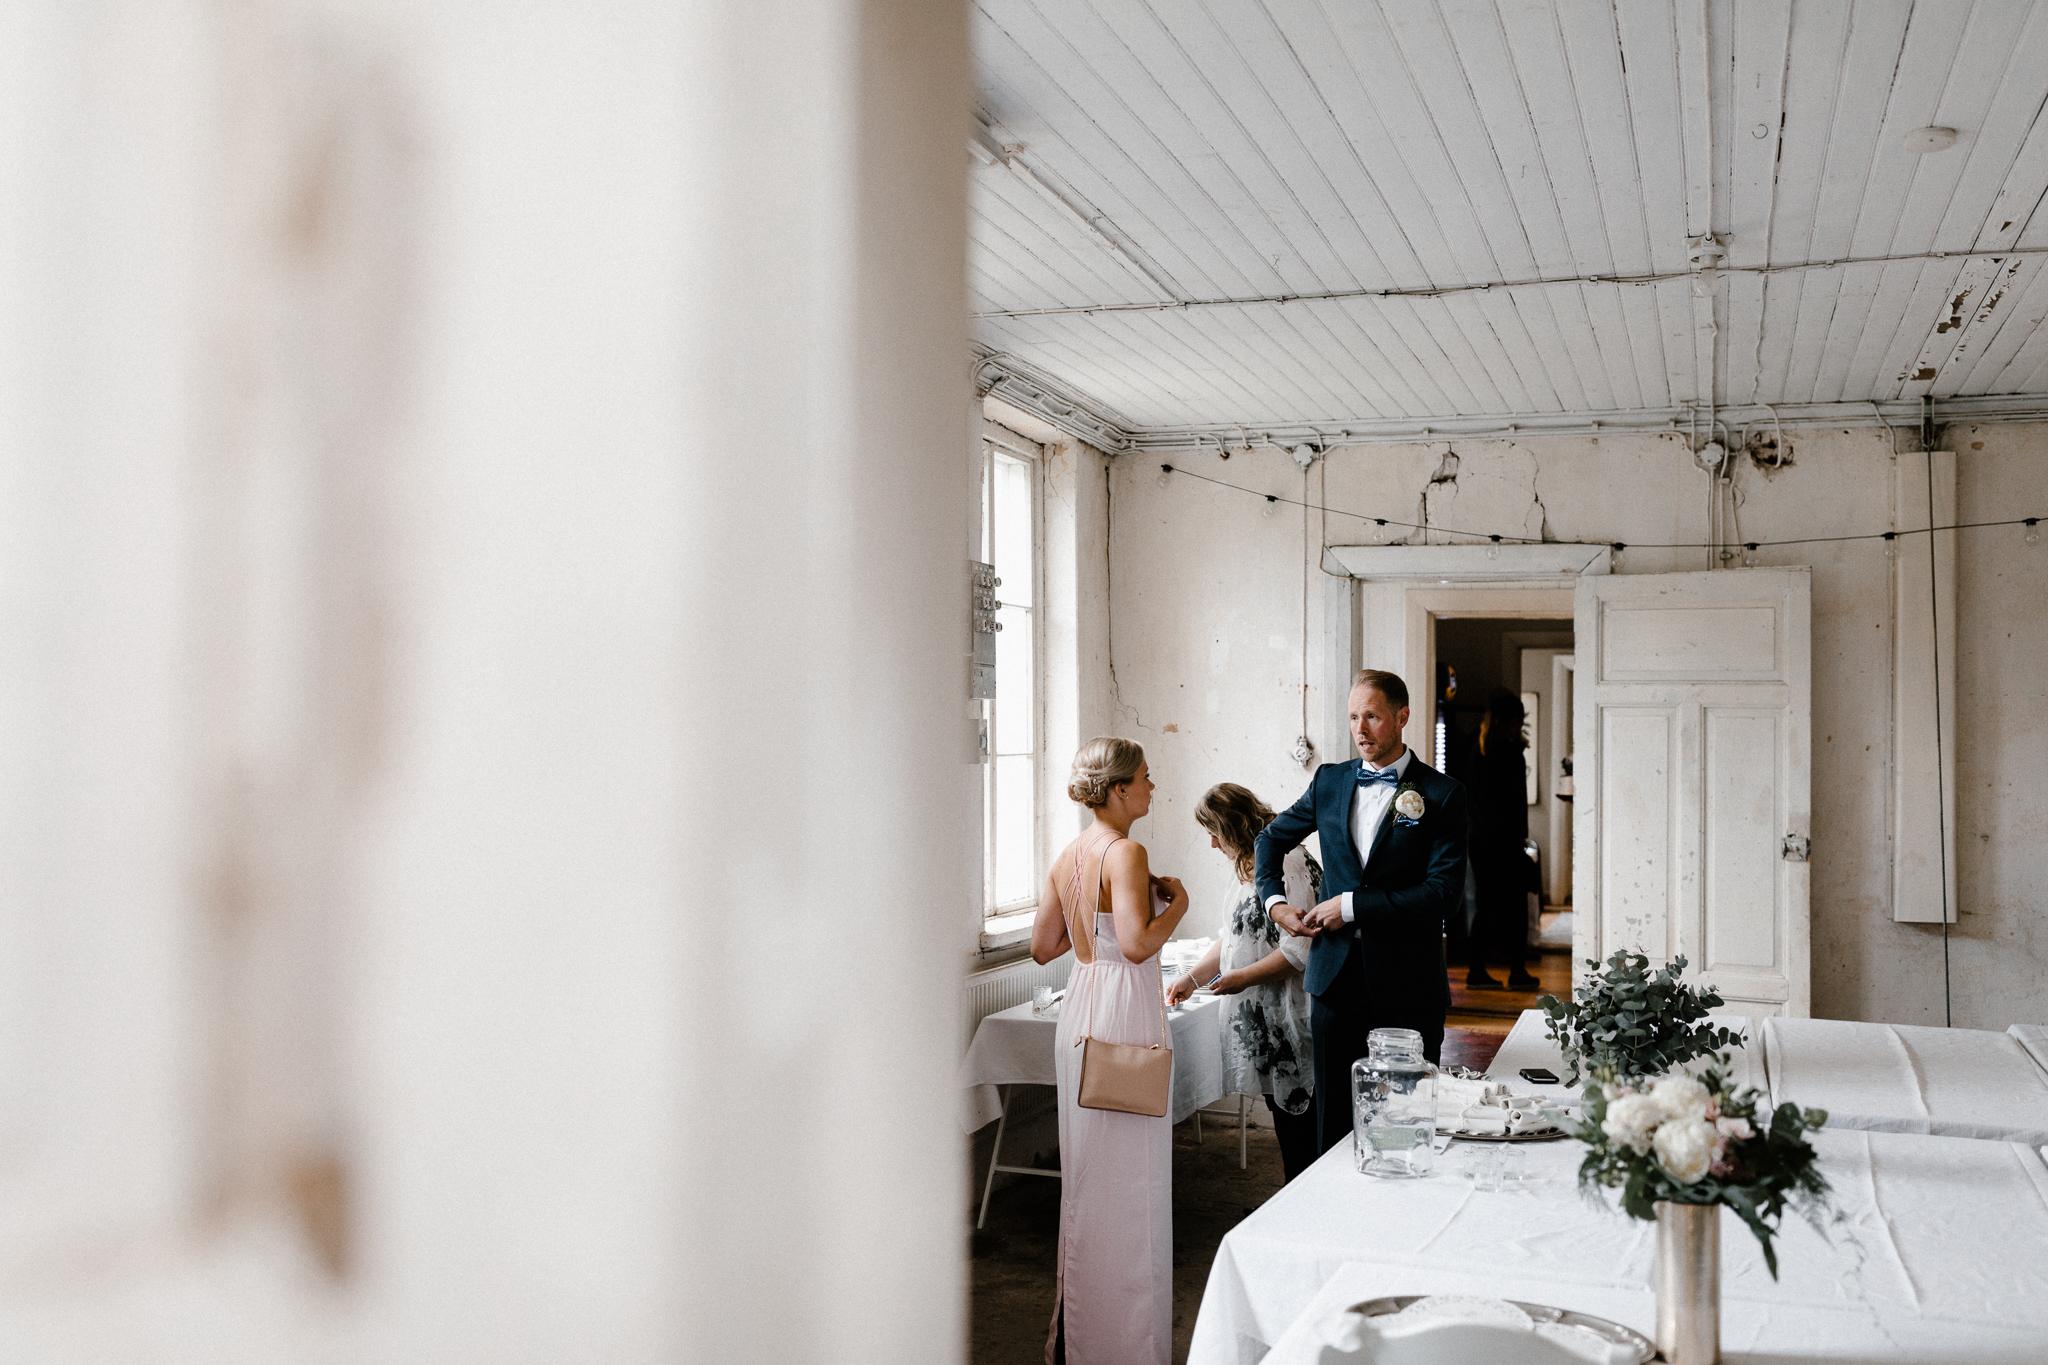 Essi + Ville   Oitbacka Gården   by Patrick Karkkolainen Wedding Photography-128.jpg